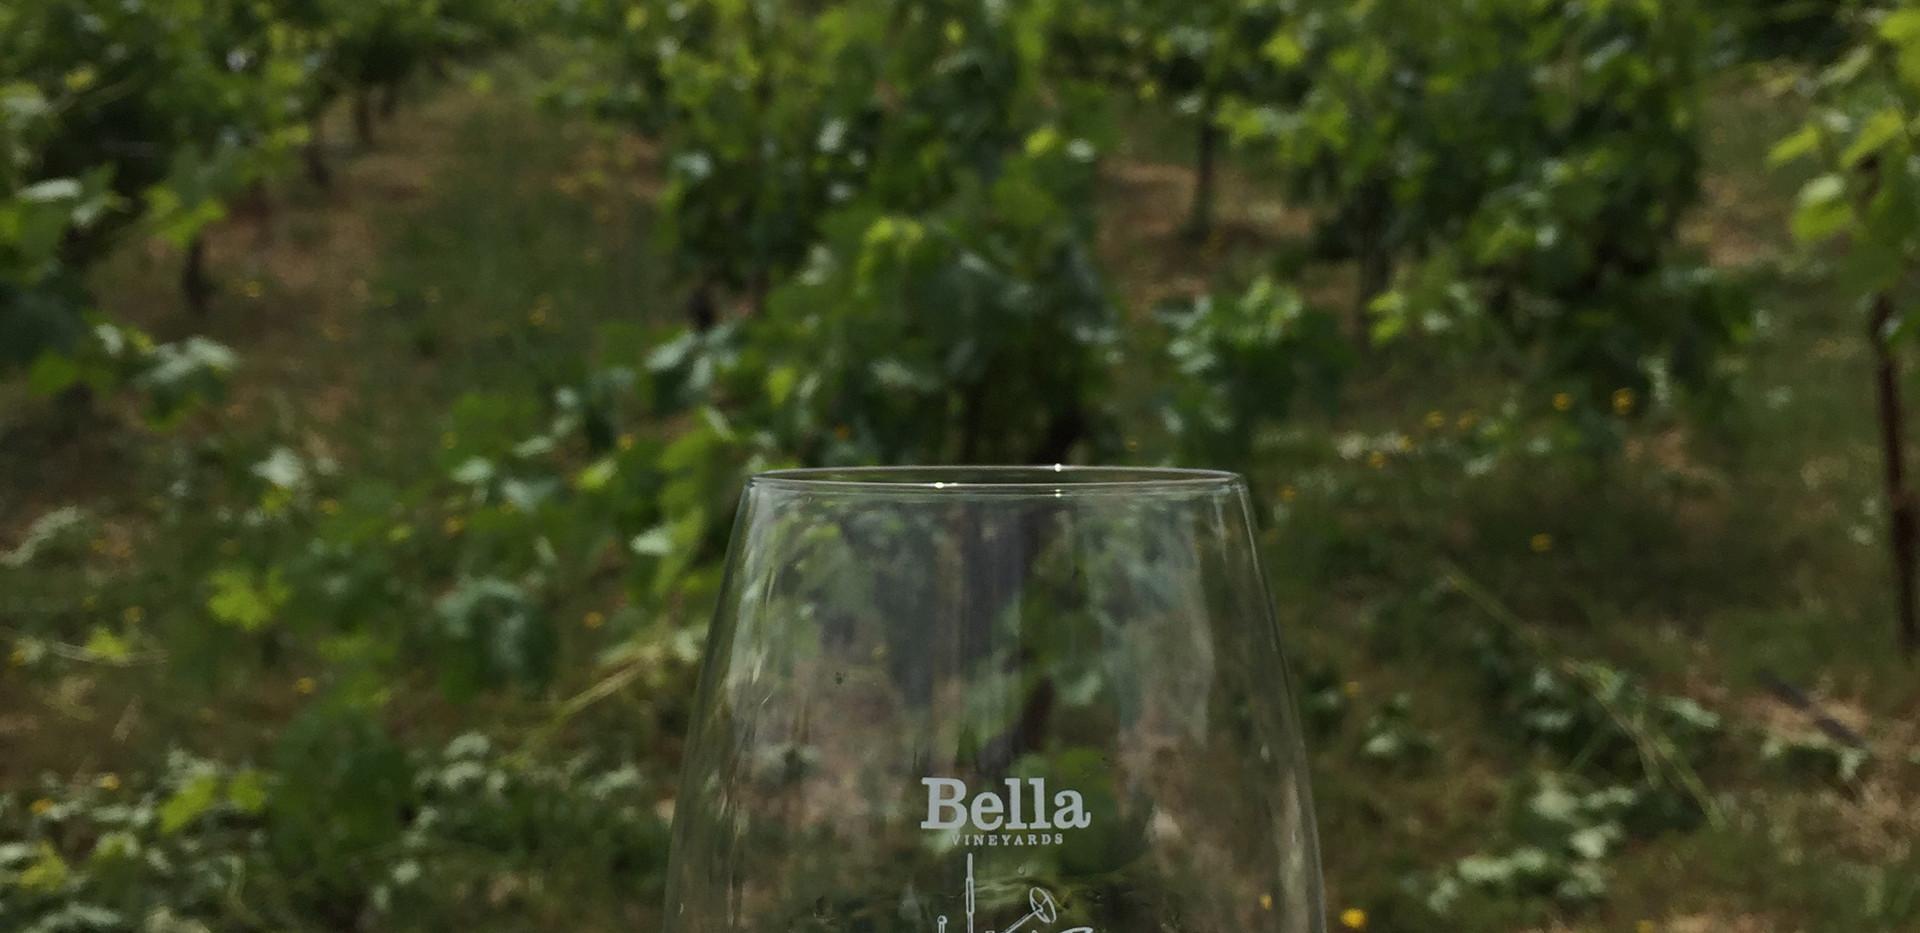 Bella ~ Healdsburg